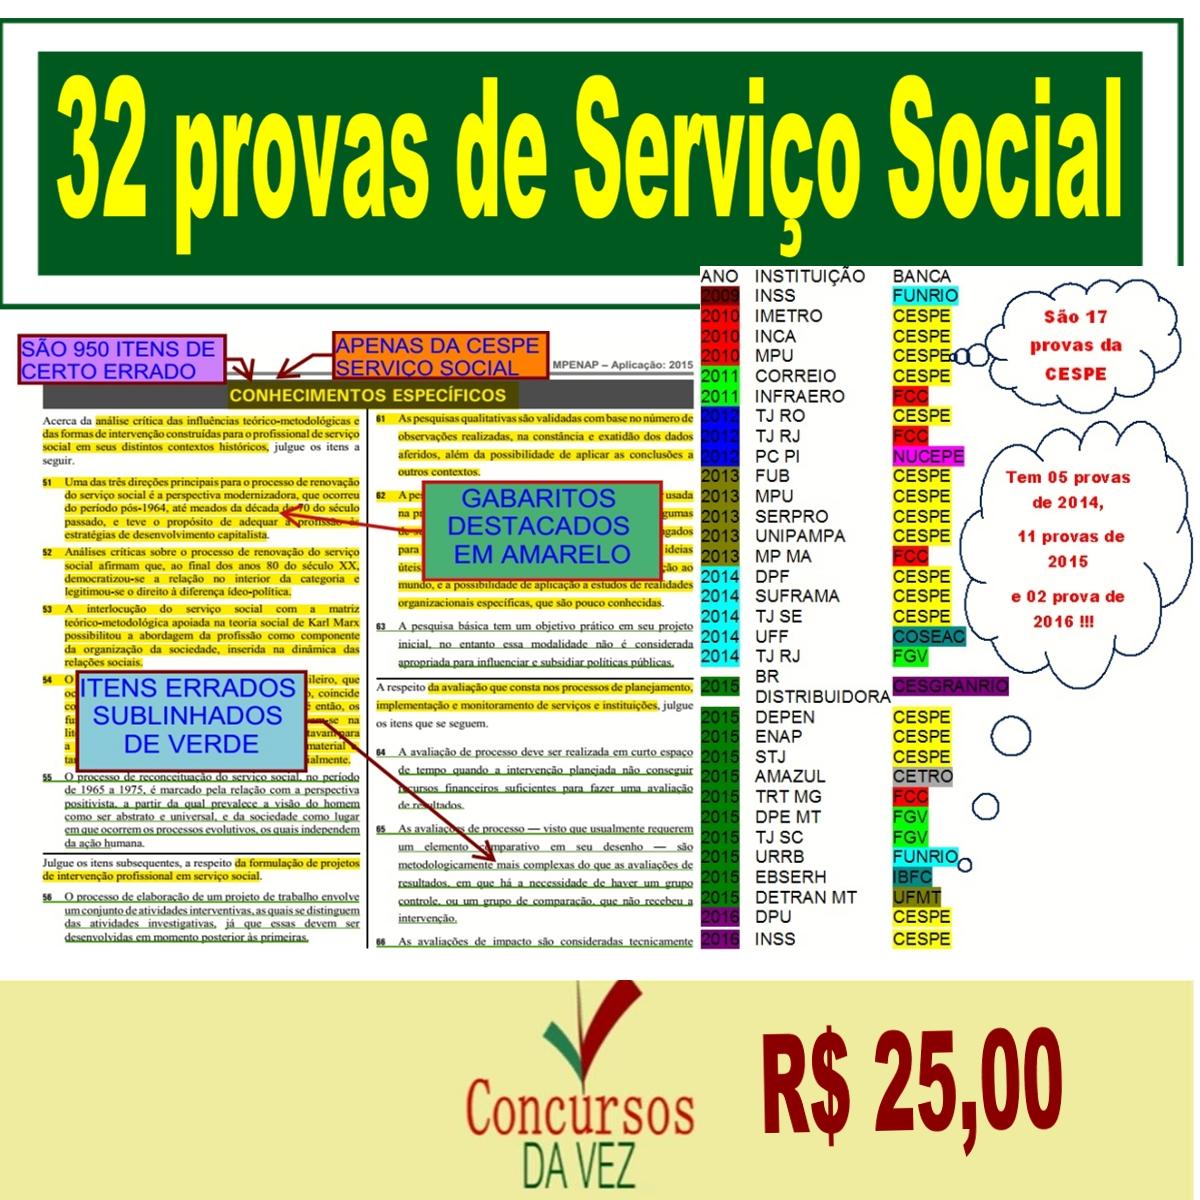 32 PROVAS DE SERVIÇO SOCIAL